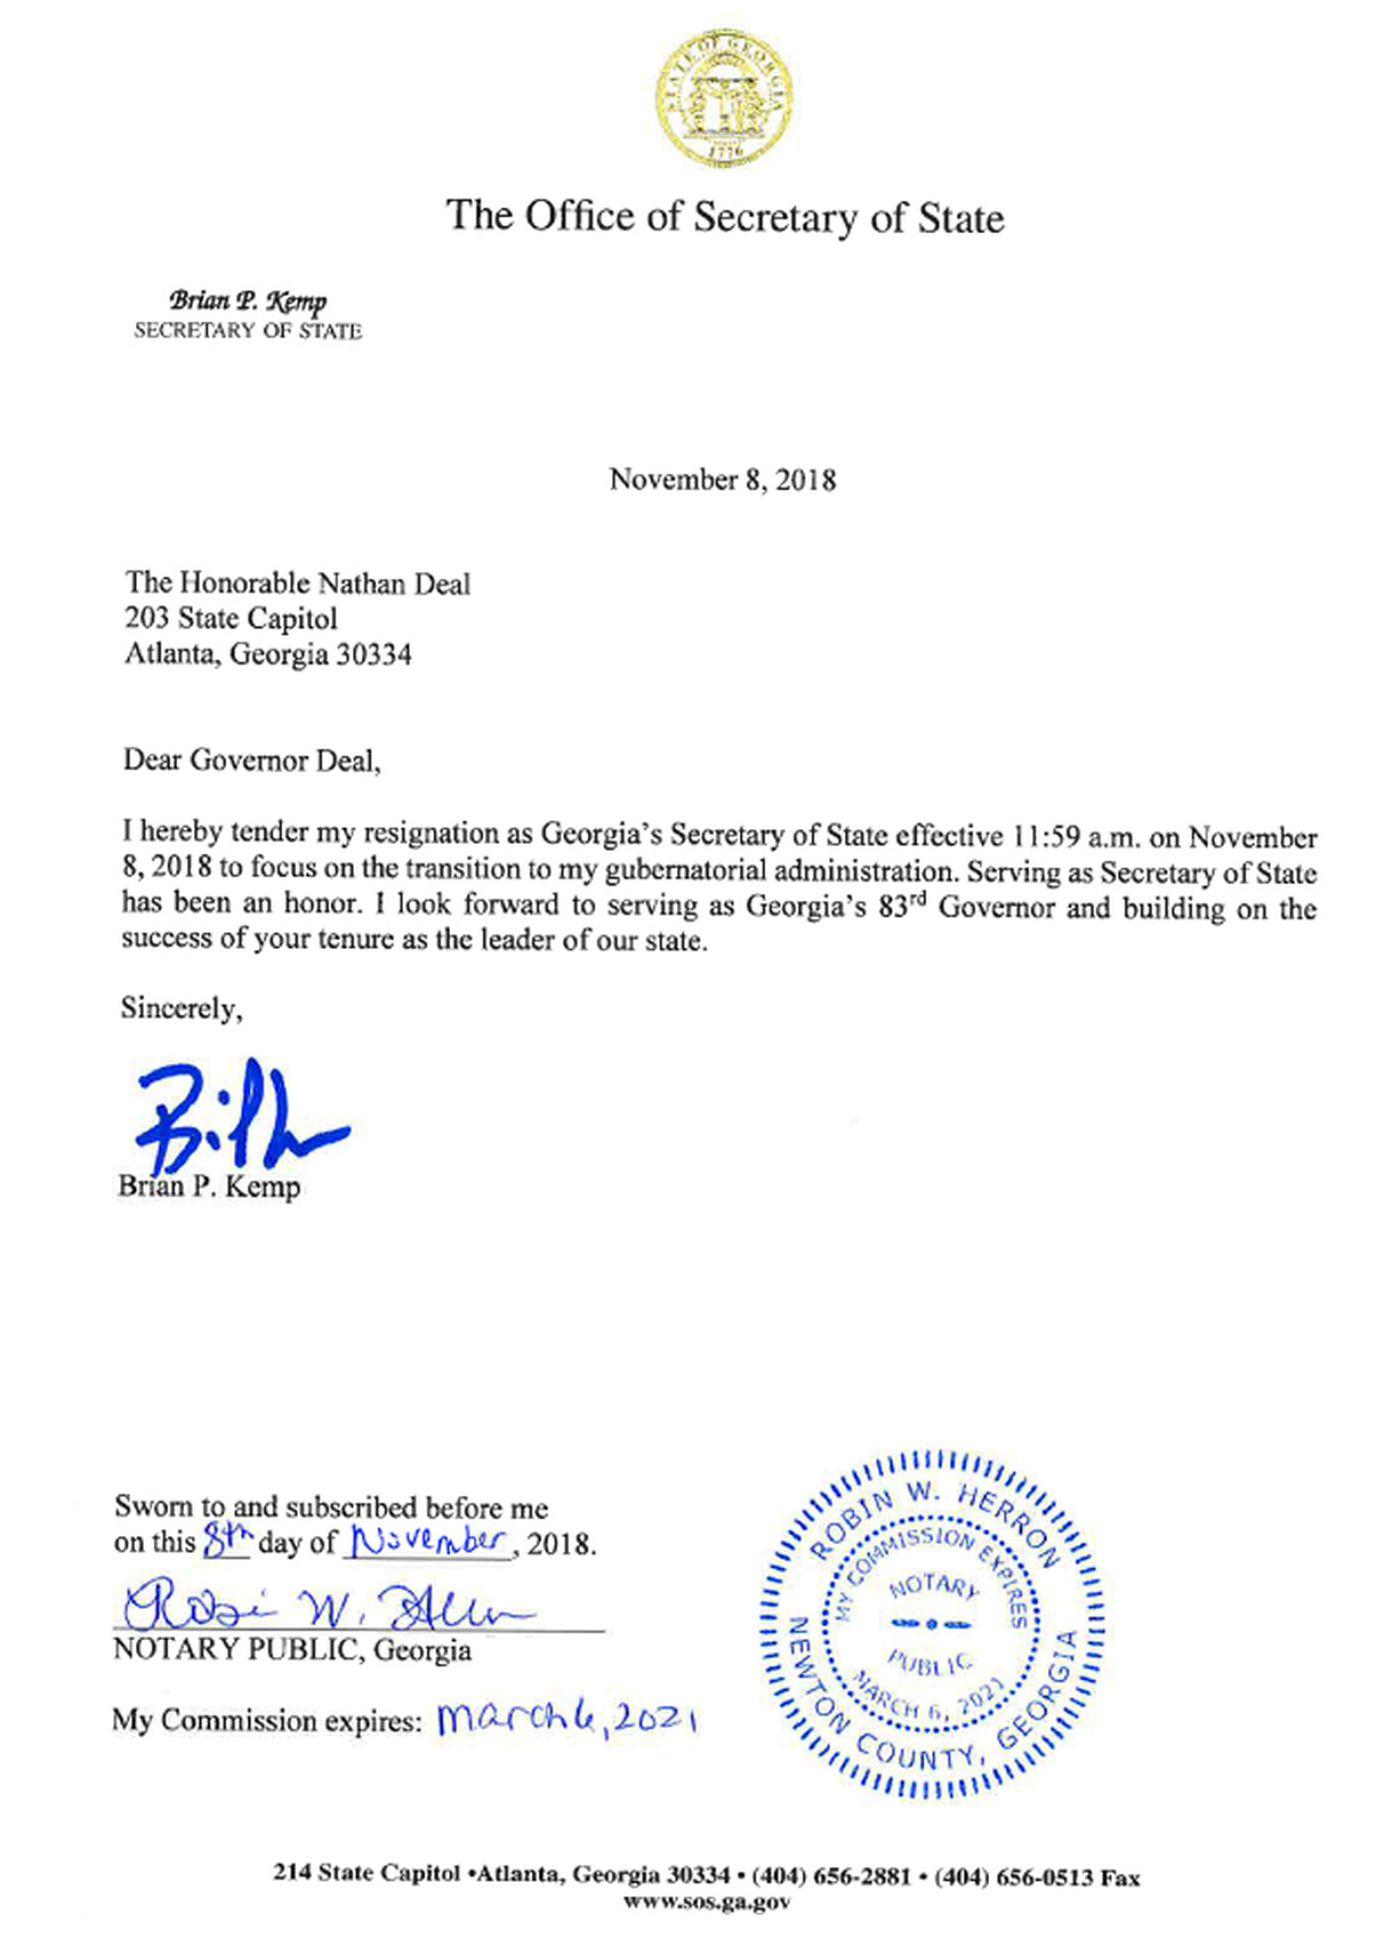 Kemp resigning as Secretary of State